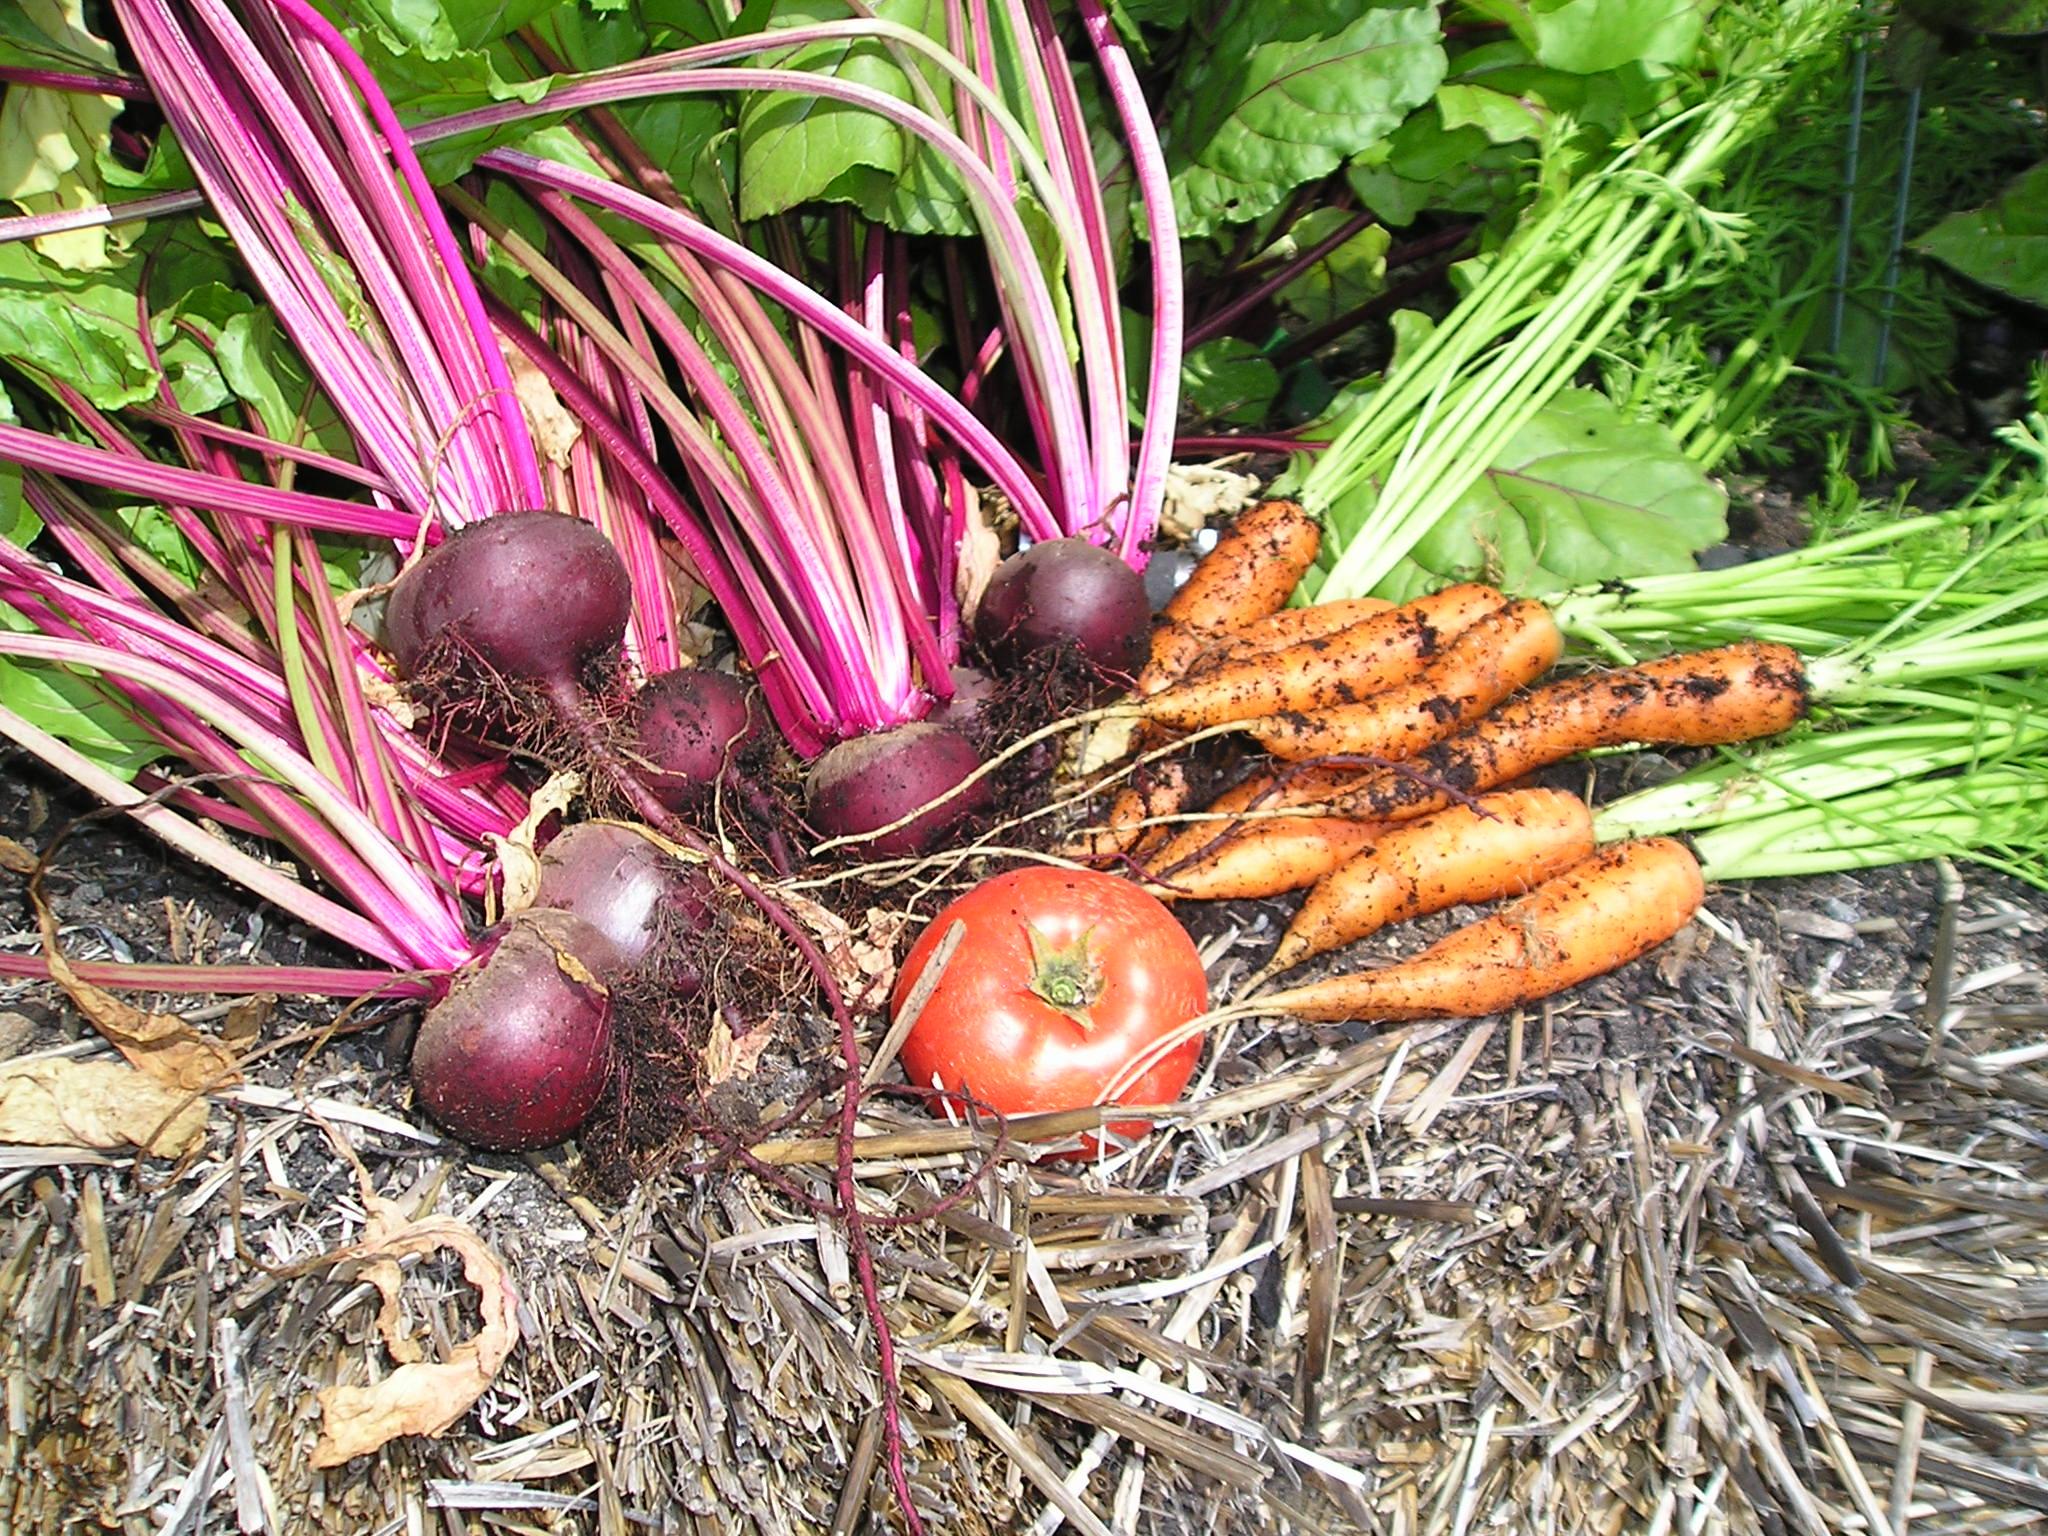 The last straw bale garden wsu master gardener program for Closed loop gardening